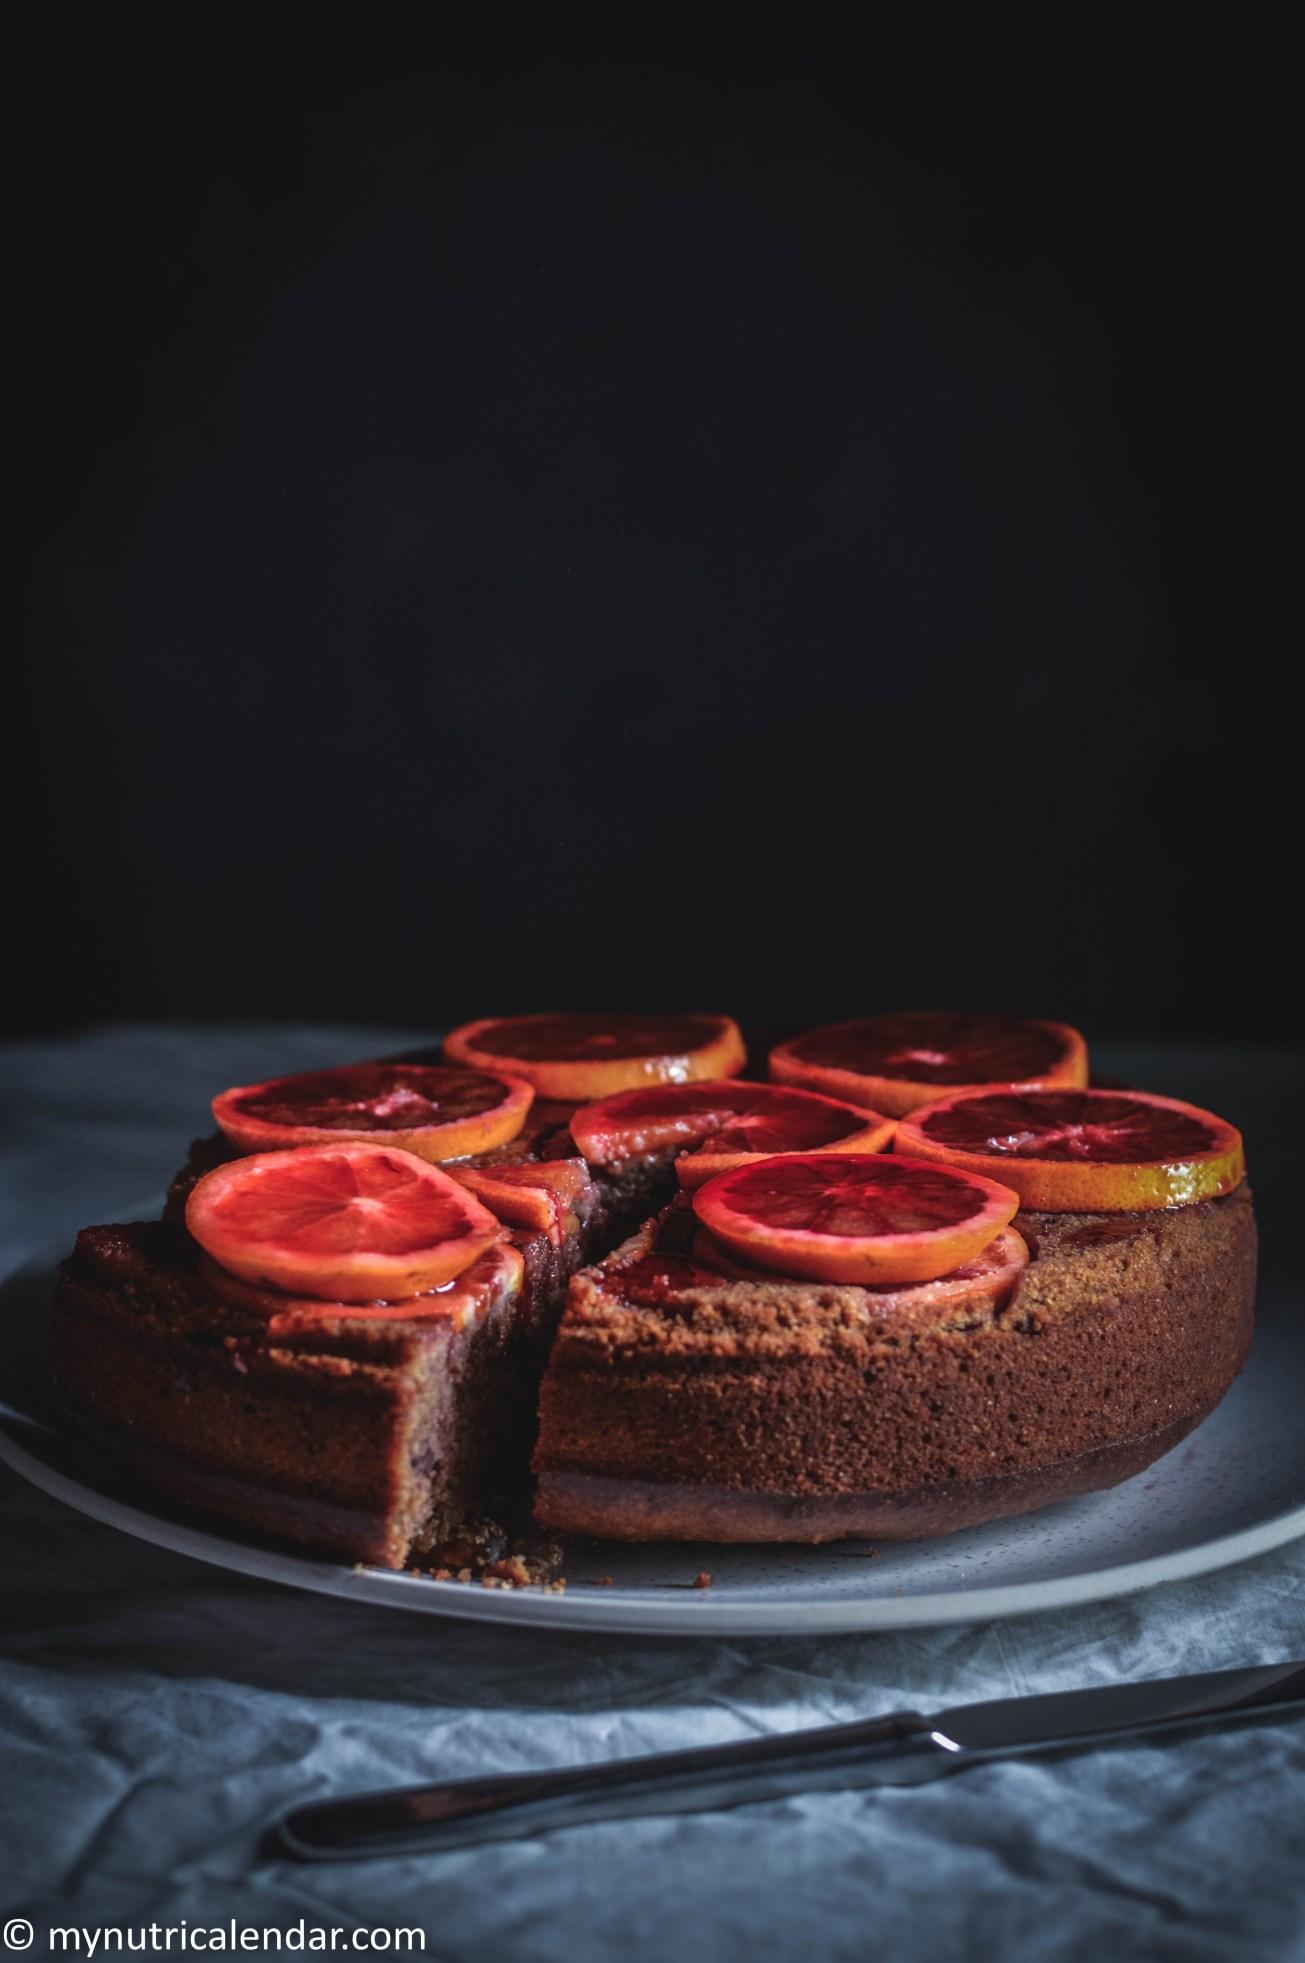 blood-orange-cake-chocolate-chips-raisins-no-sugar-6